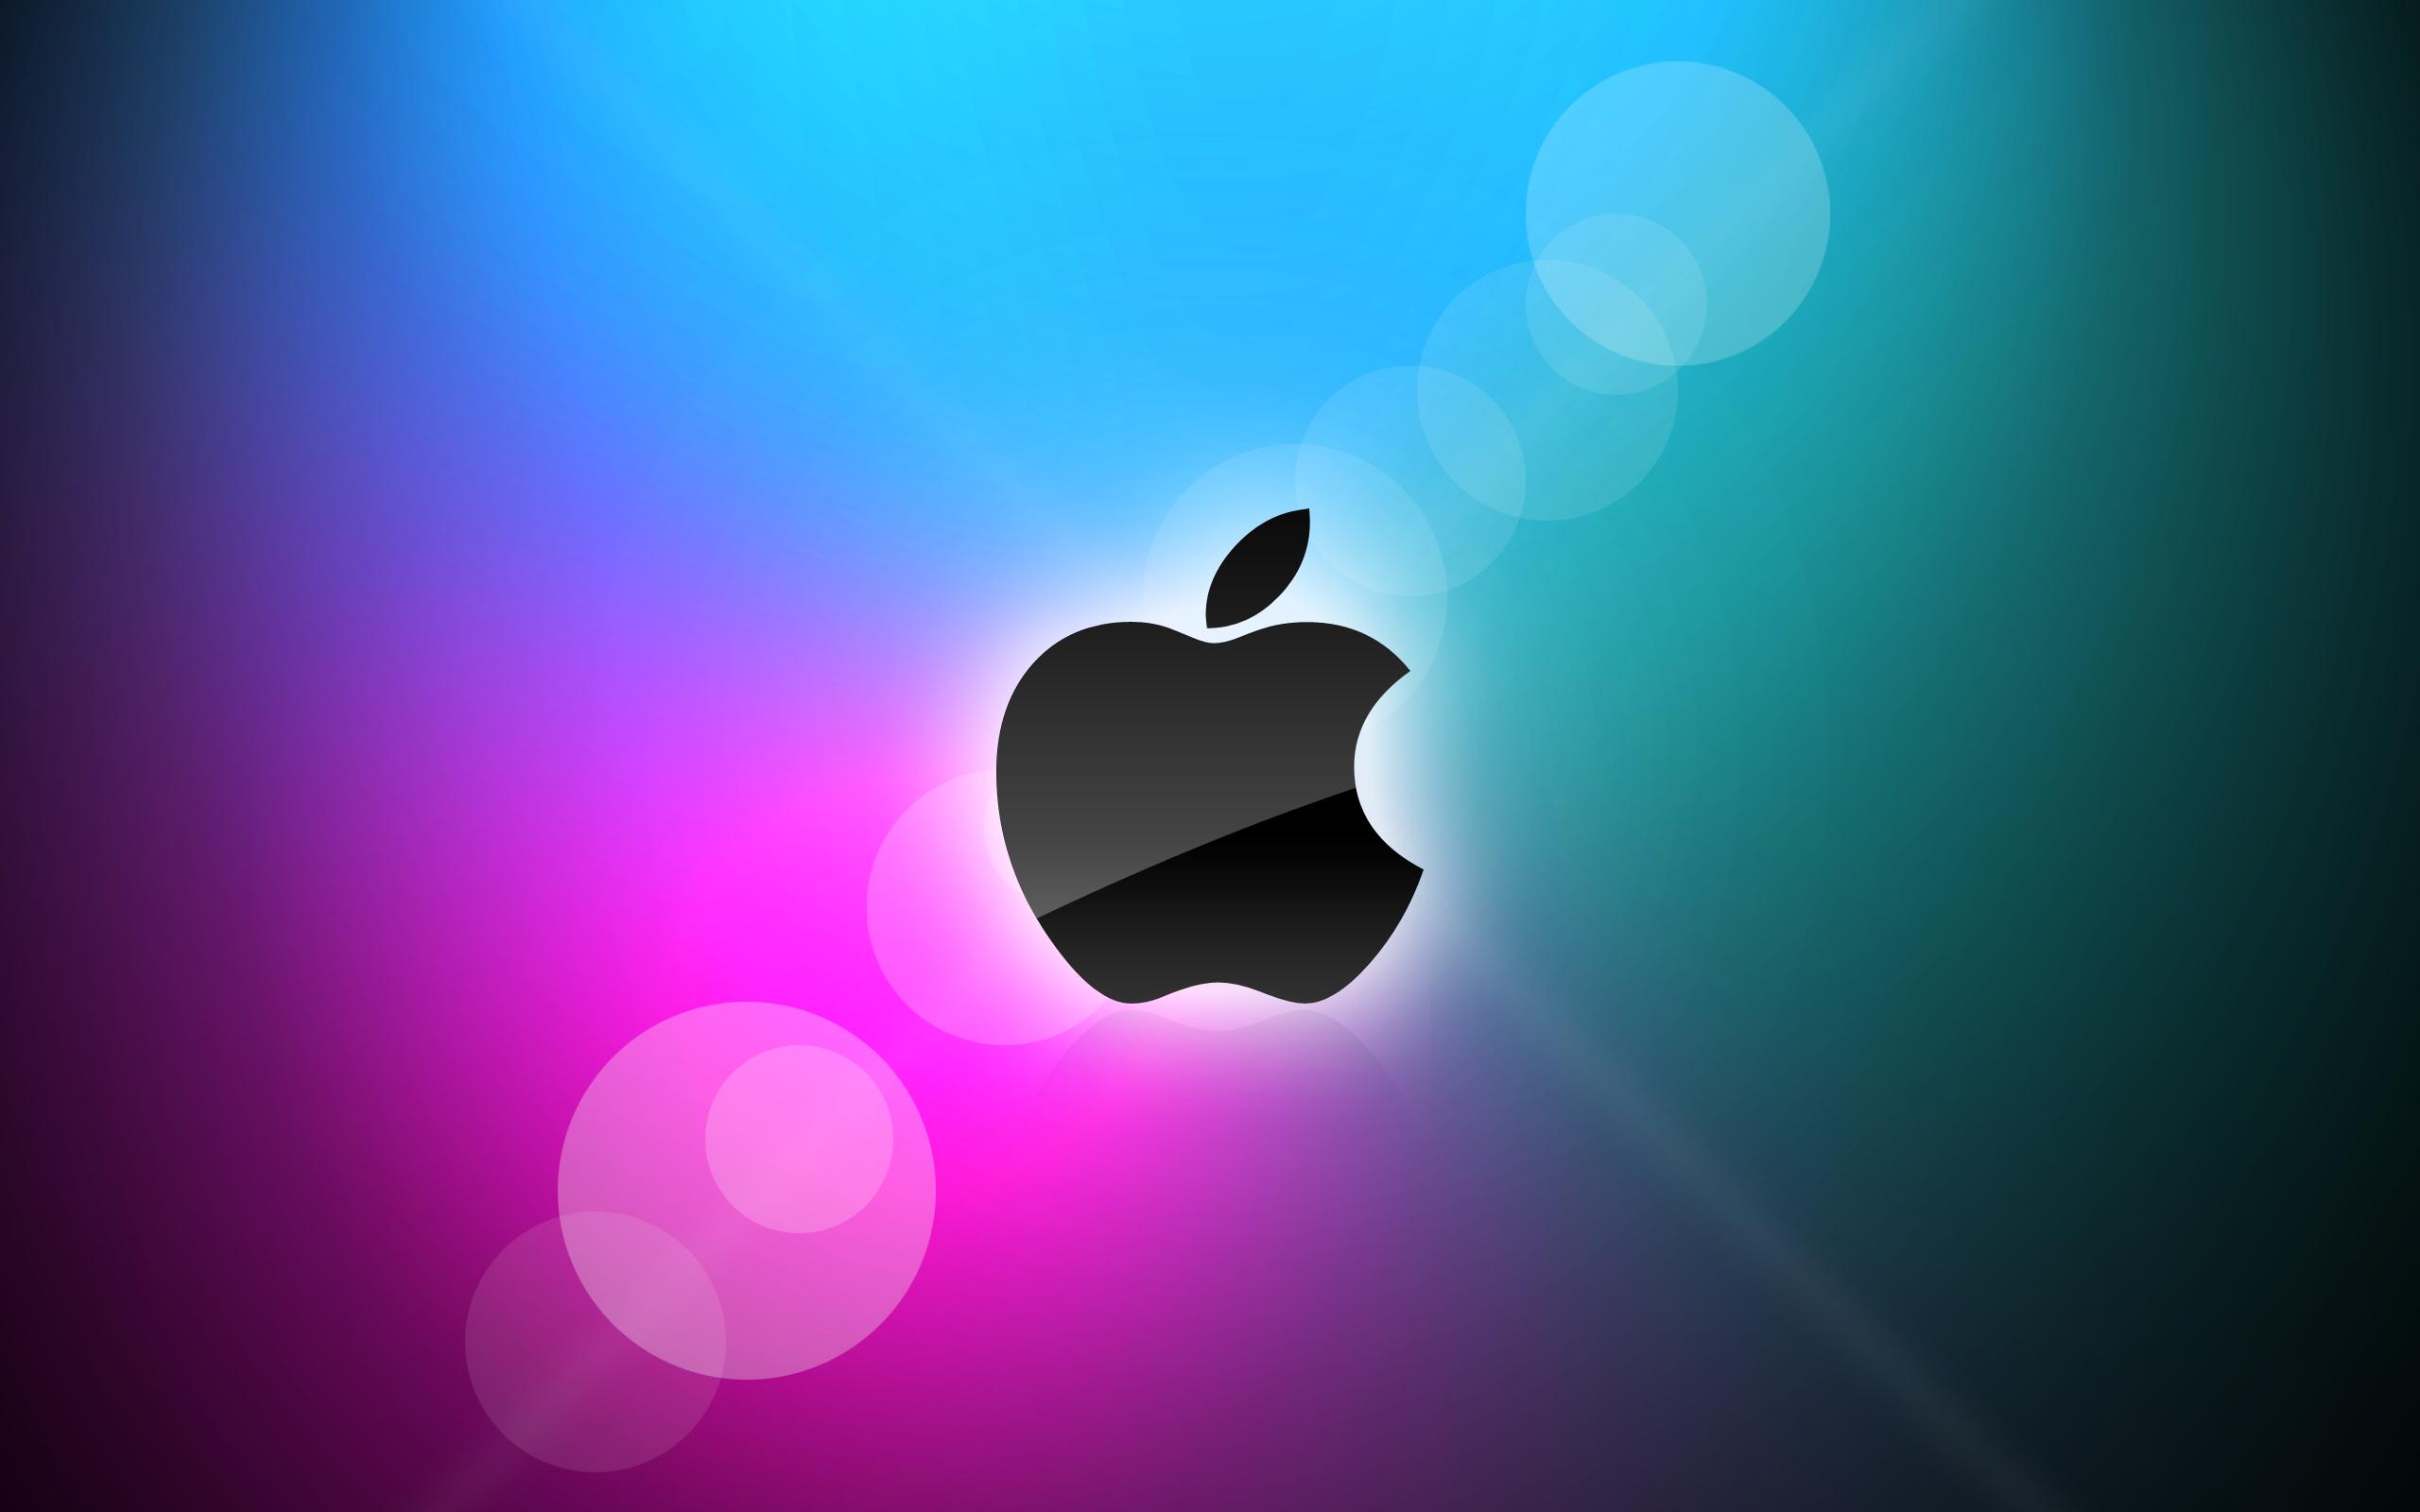 Image for Apple Mac HD Wallpaper Download Apple Mac Wallpaper 2560x1600